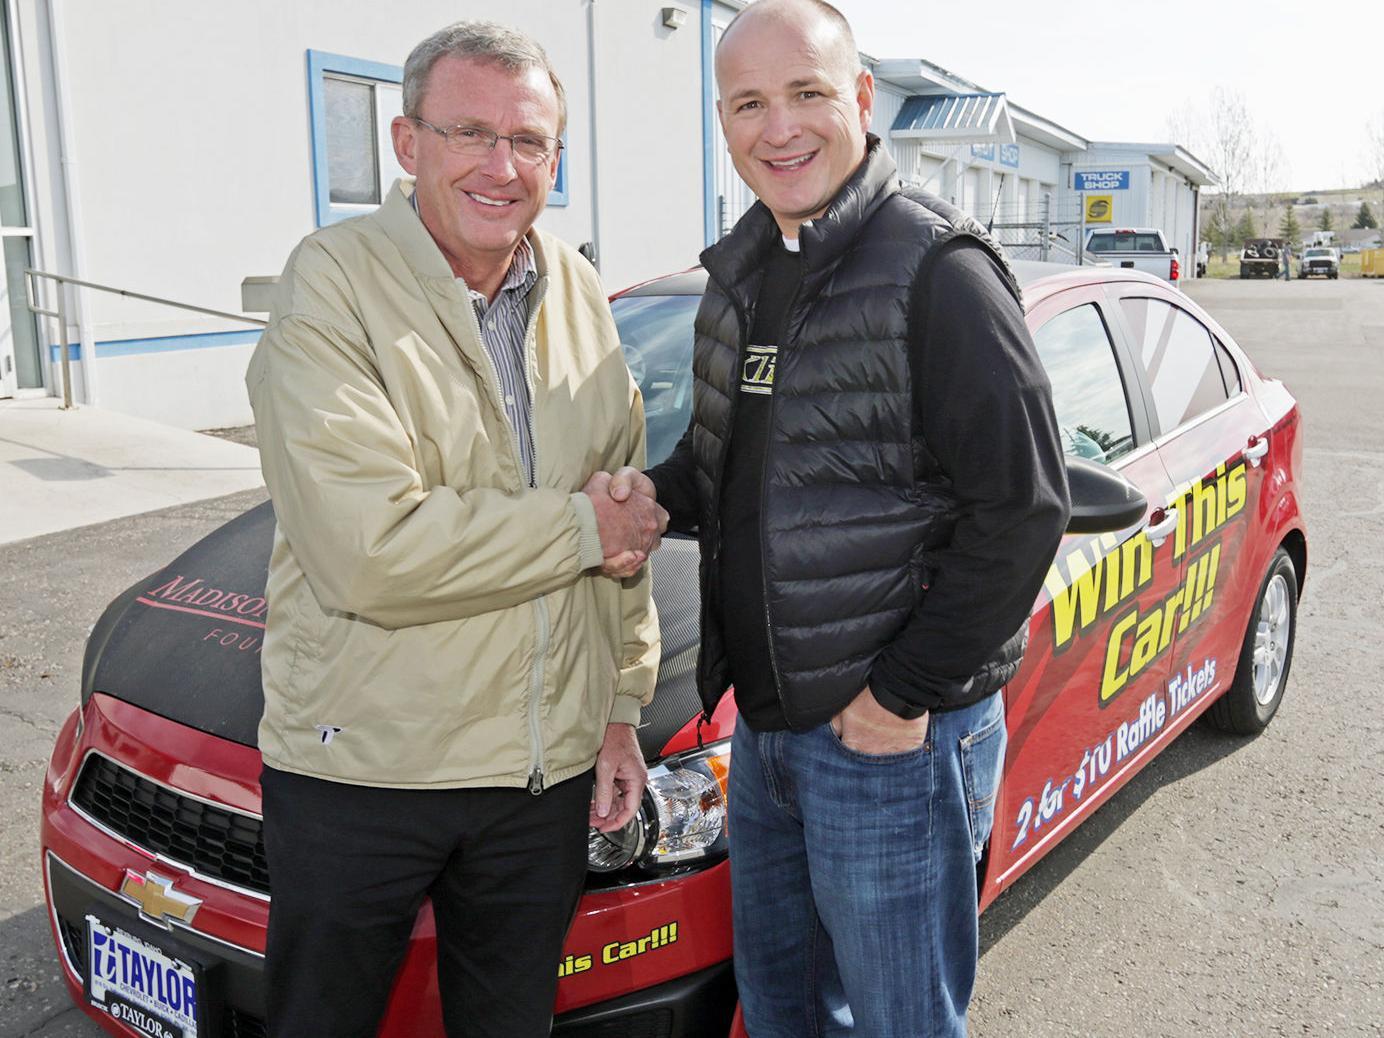 Winner Announced In Taylor Chevrolet Giveaway Page 2 Rexburgstandardjournal Com